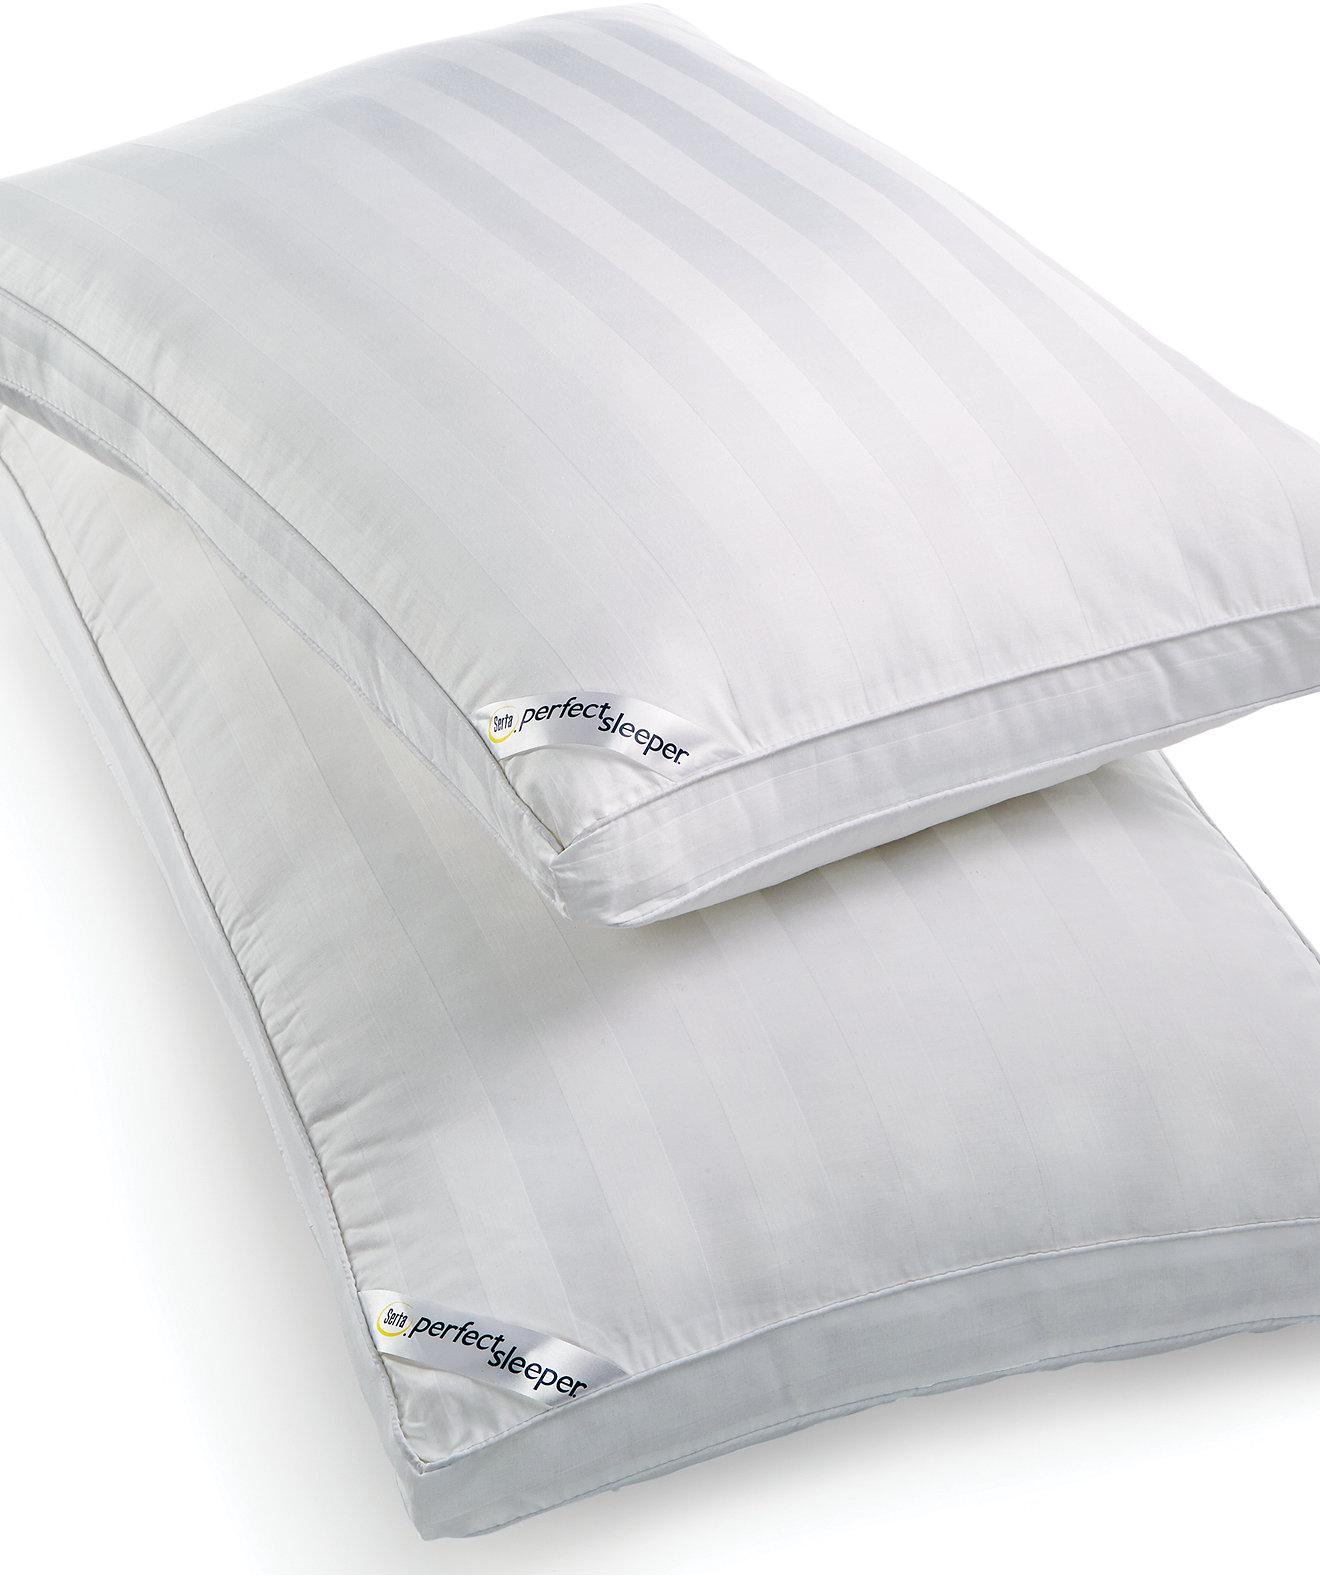 Serta Perfect Sleeper SlumberGel Pillows - Pillows - Bed & Bath - Macy's